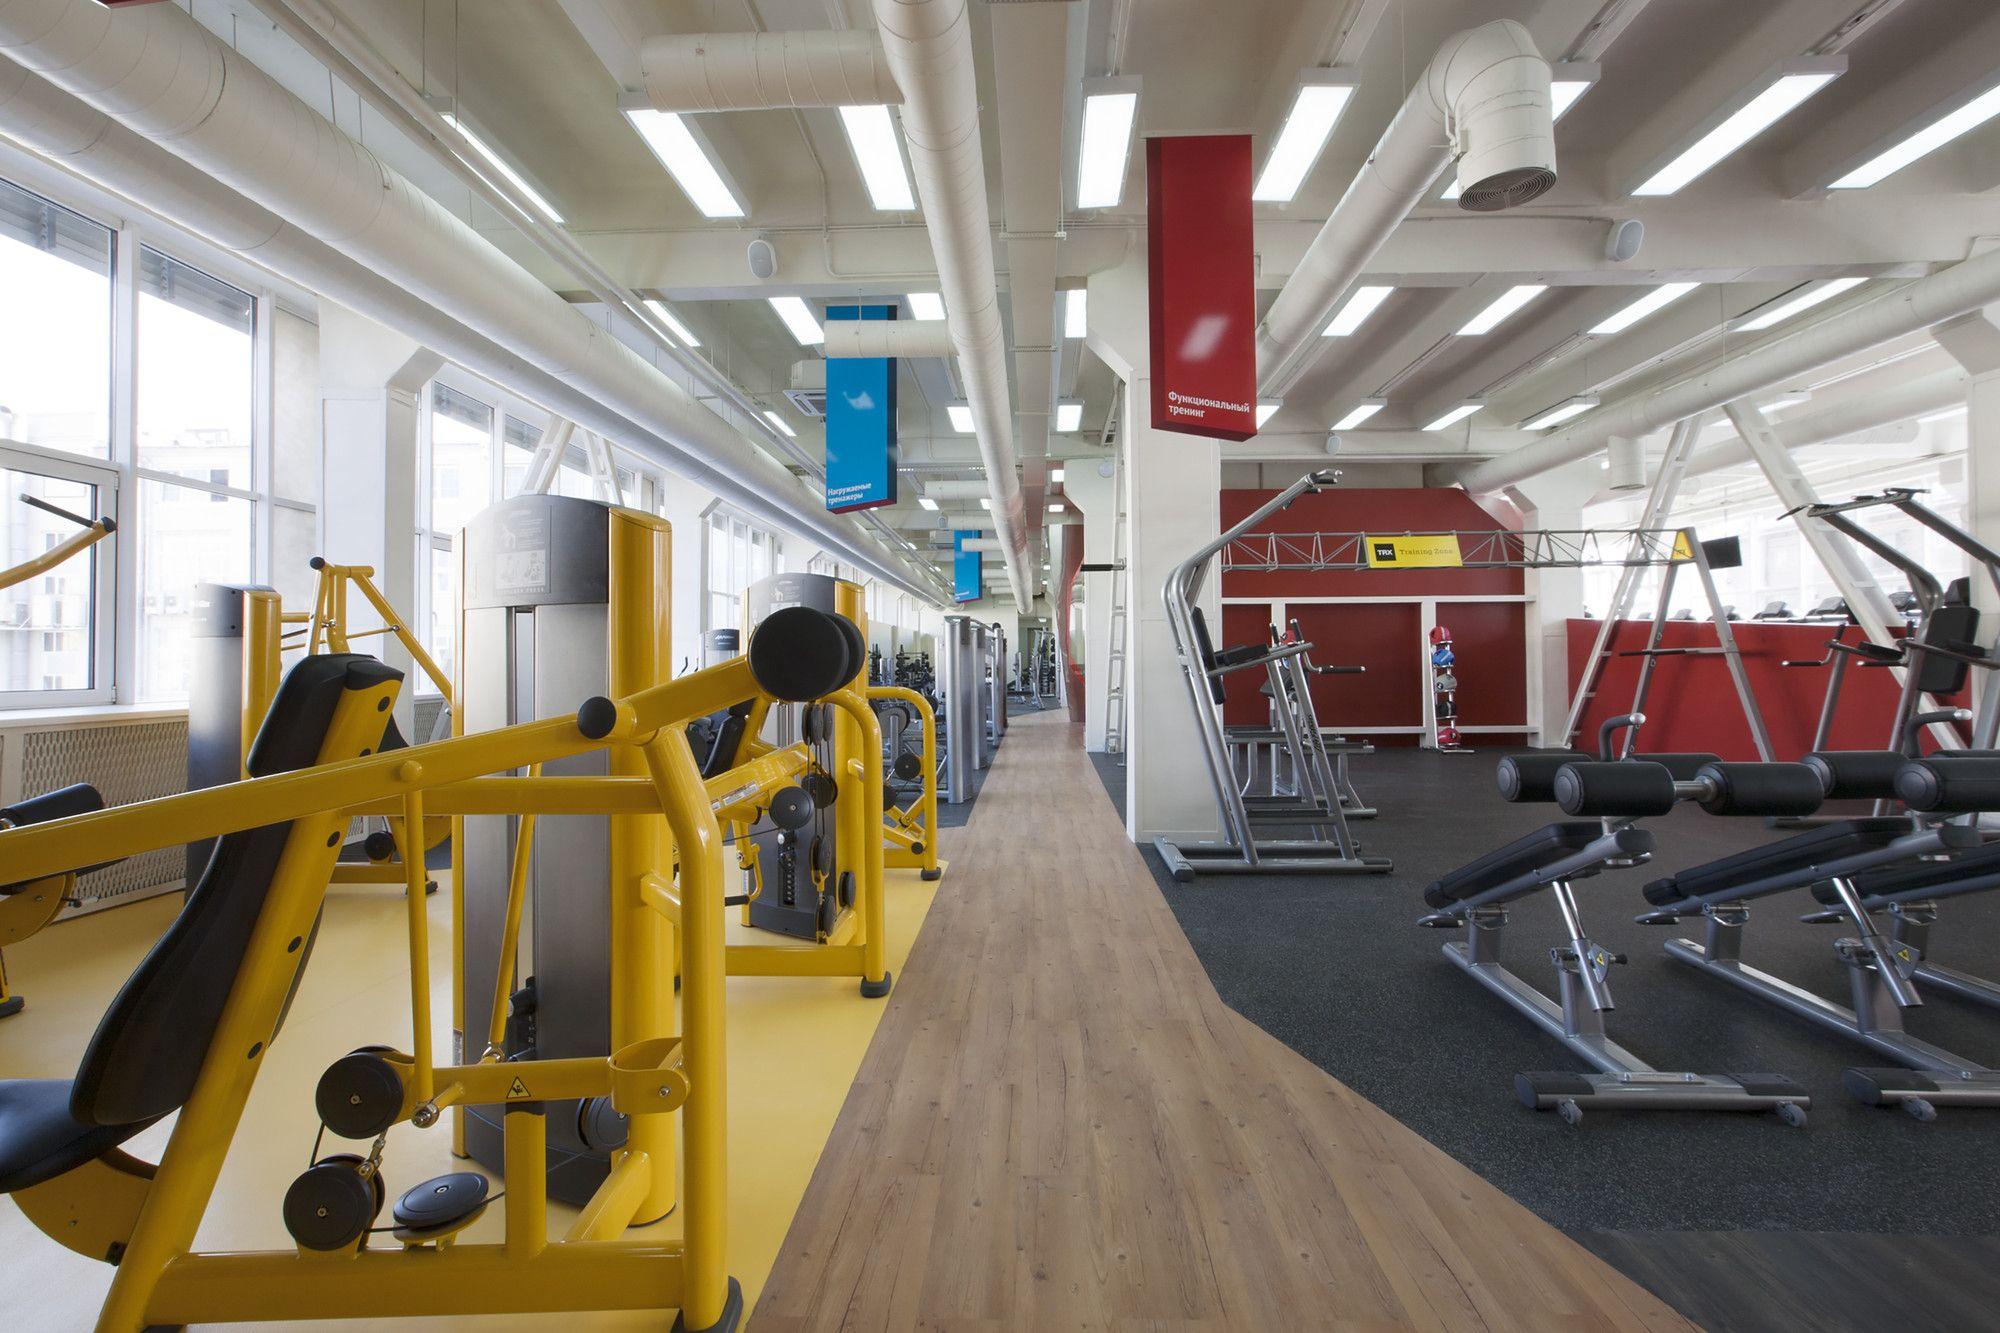 Gallery Of Smena Fitness Club Za Bor Architects 5 Fitness Club Architect Gym Interior